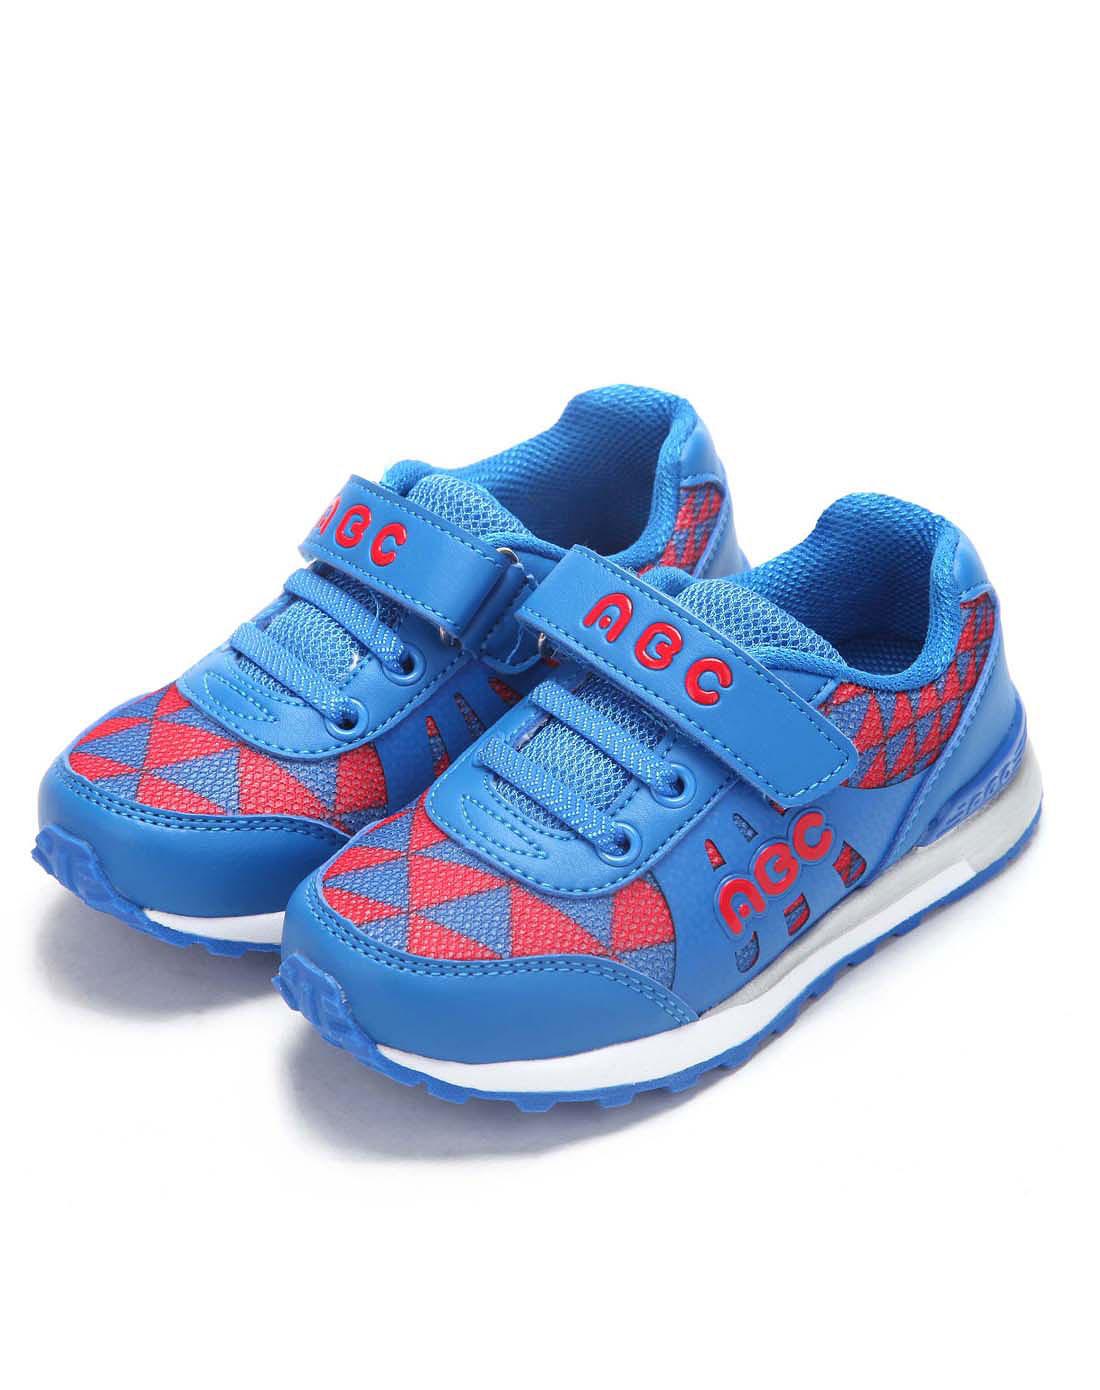 abckids男女童鞋男小童宝蓝红休闲运动鞋y2322306d